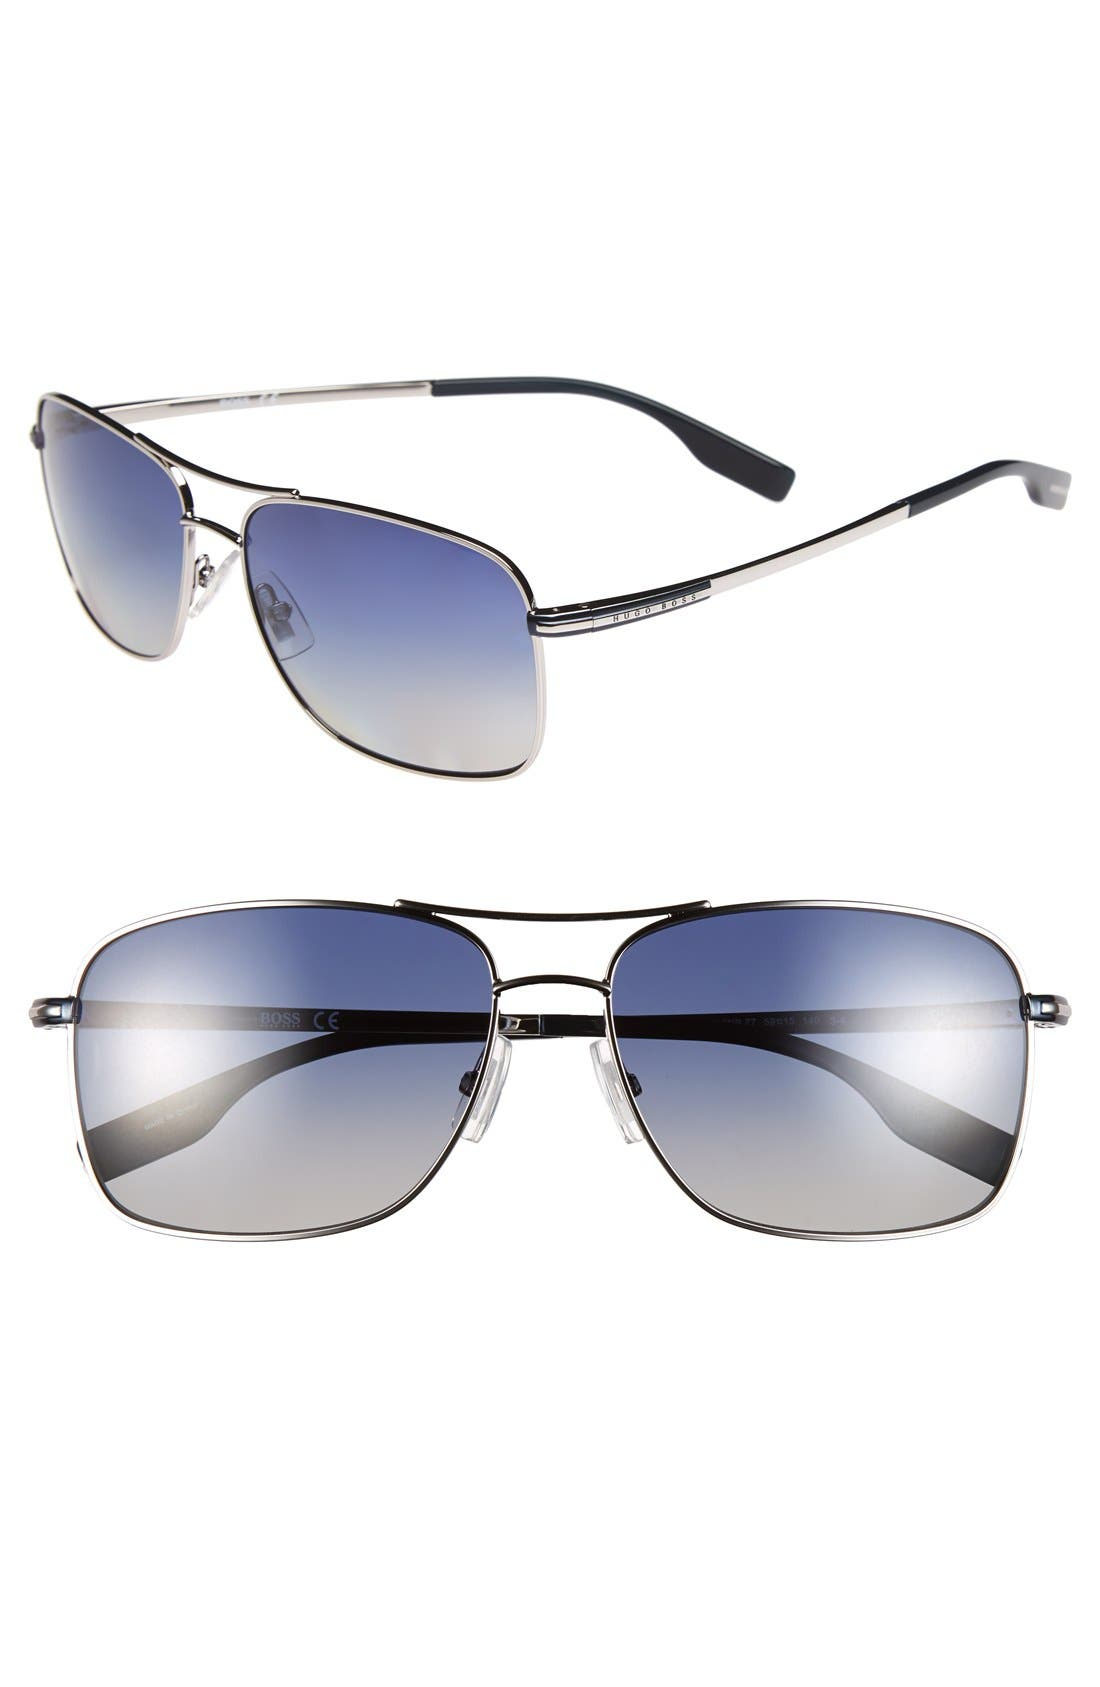 Alternate Image 1 Selected - BOSS 59mm Polarized Navigator Sunglasses